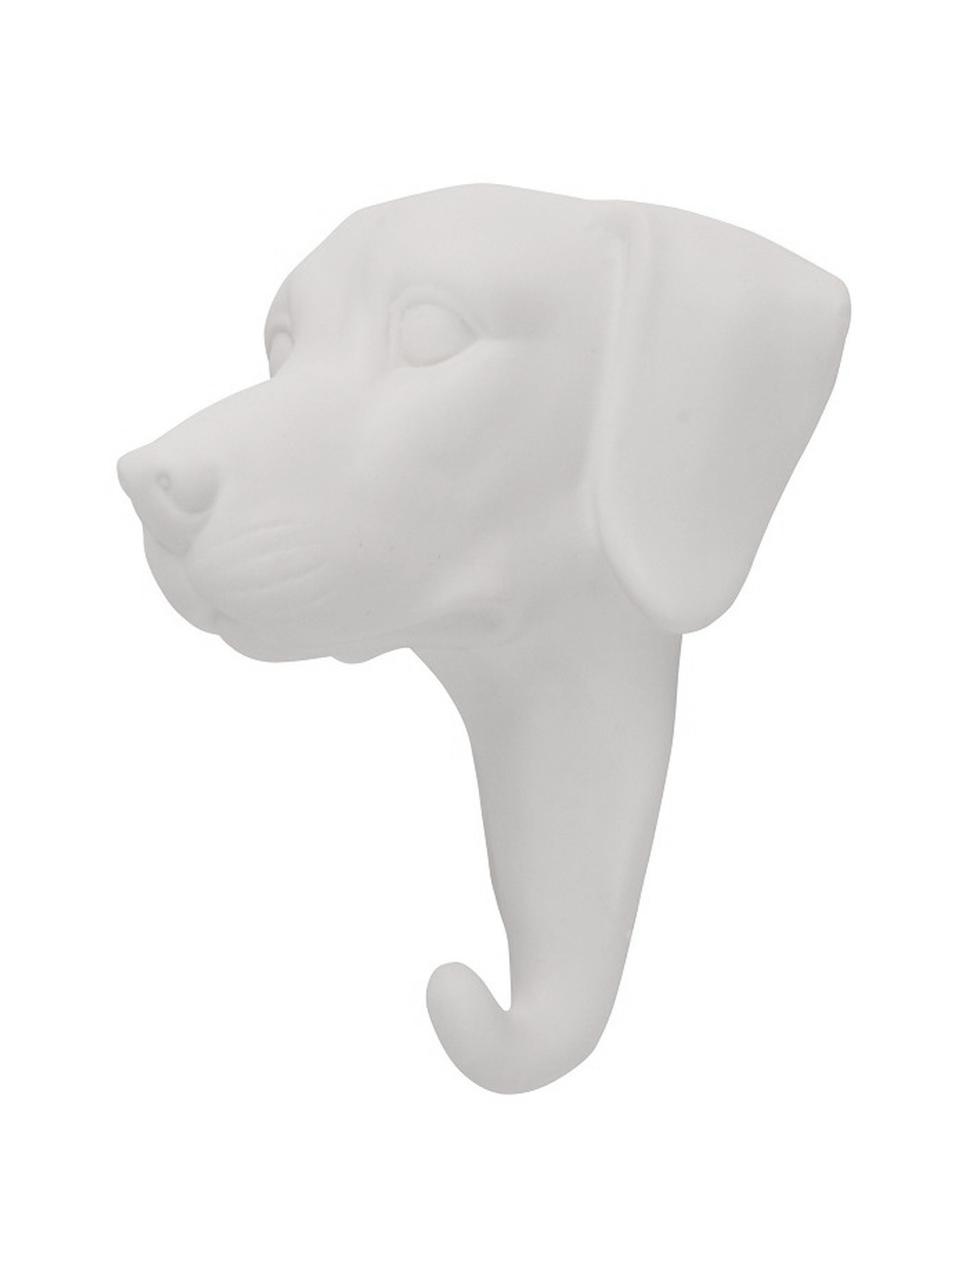 Wandhaken Dog aus Porzellan, Porzellan, Weiß, H 13 cm